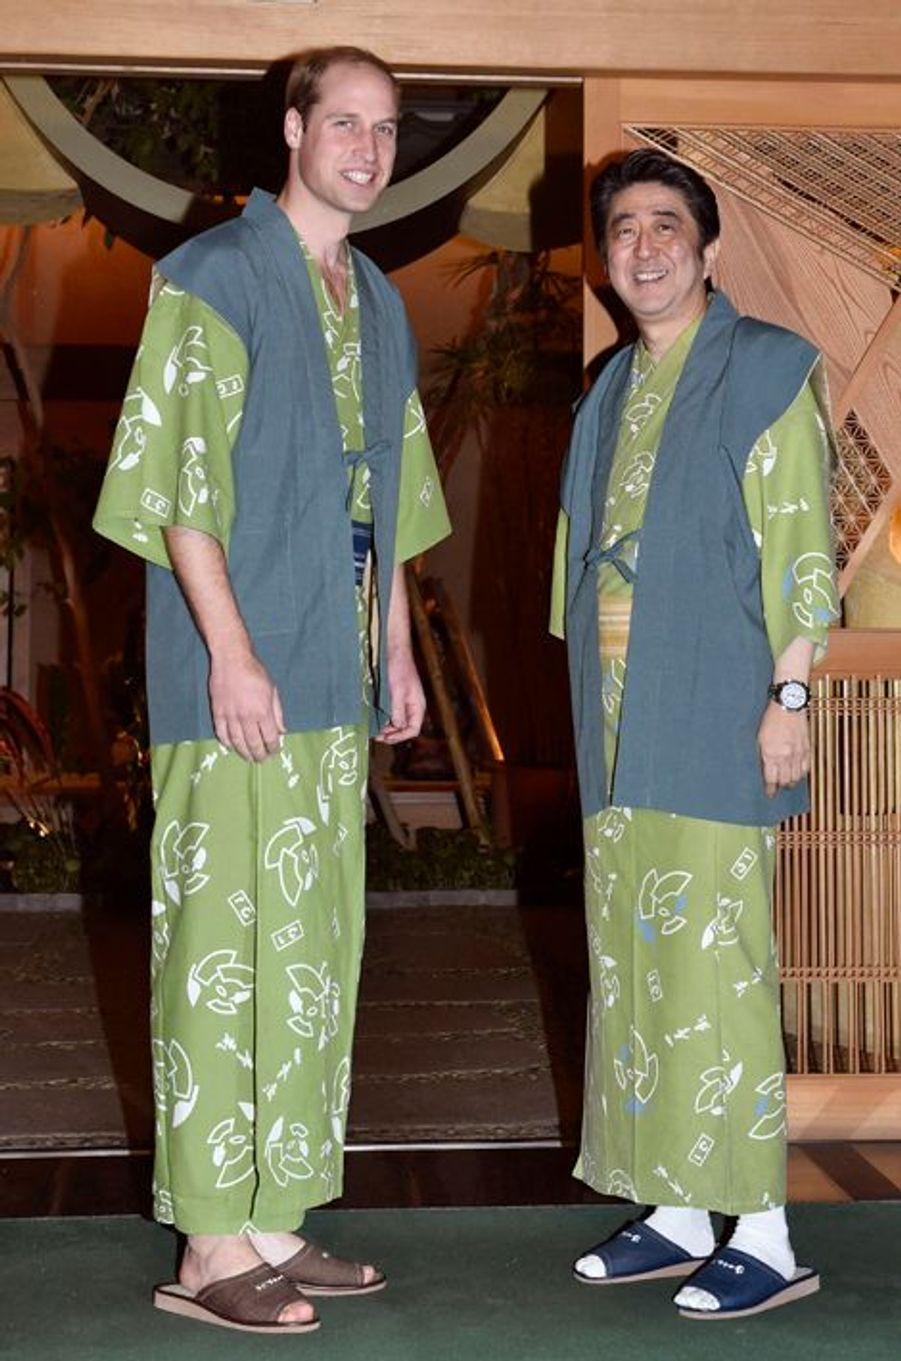 Le prince William avec Shinzo Abe à Koriyama, le 28 février 2015